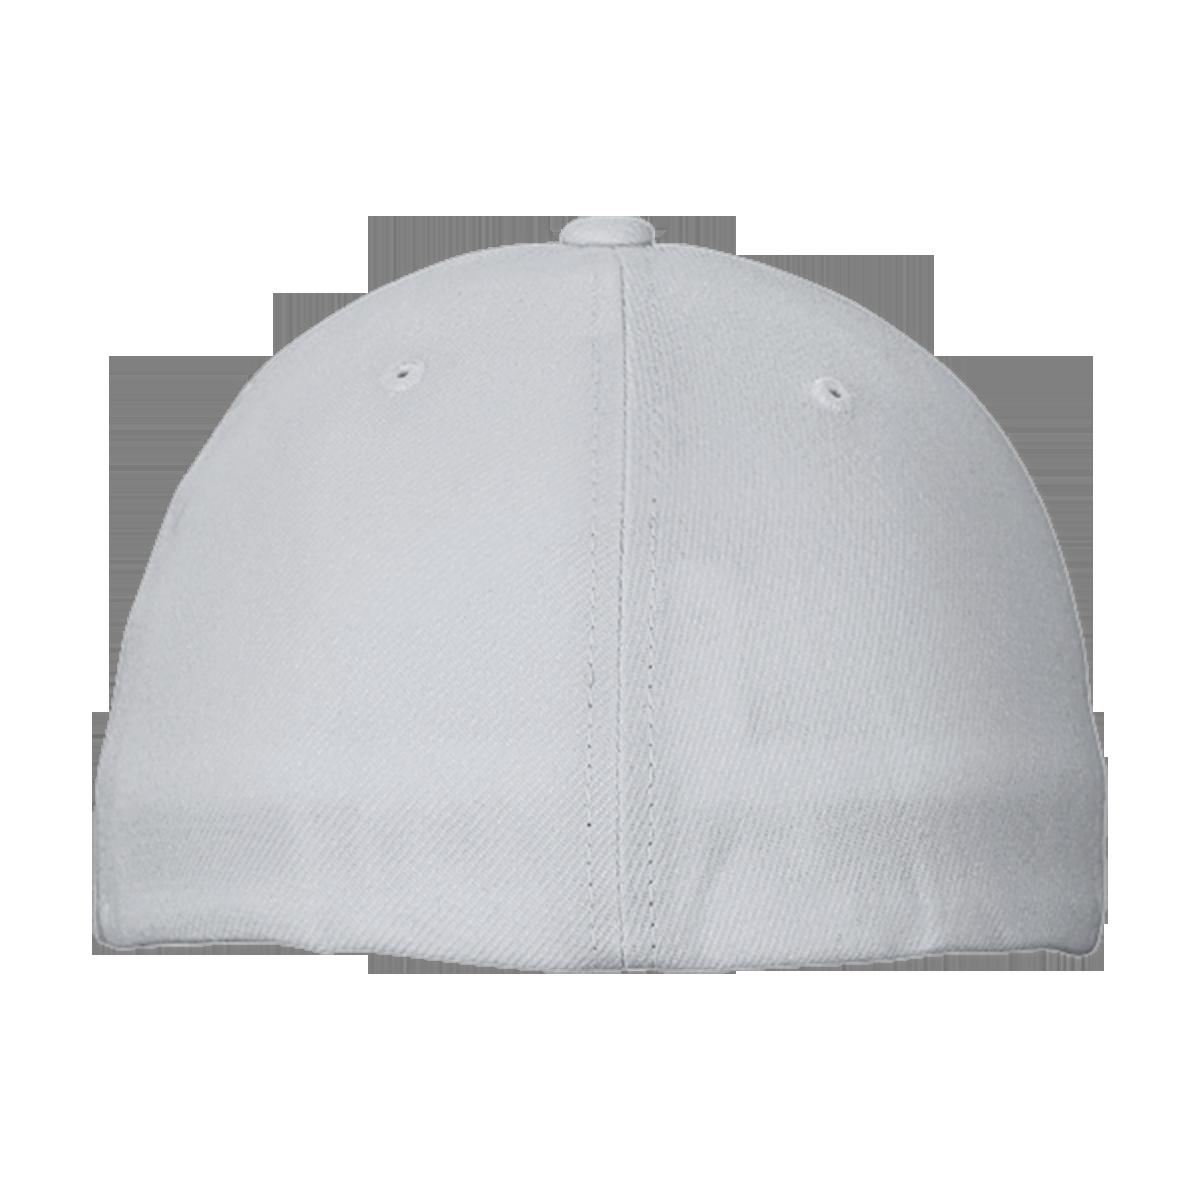 Unique cheap custom baseball caps - Embroidery back